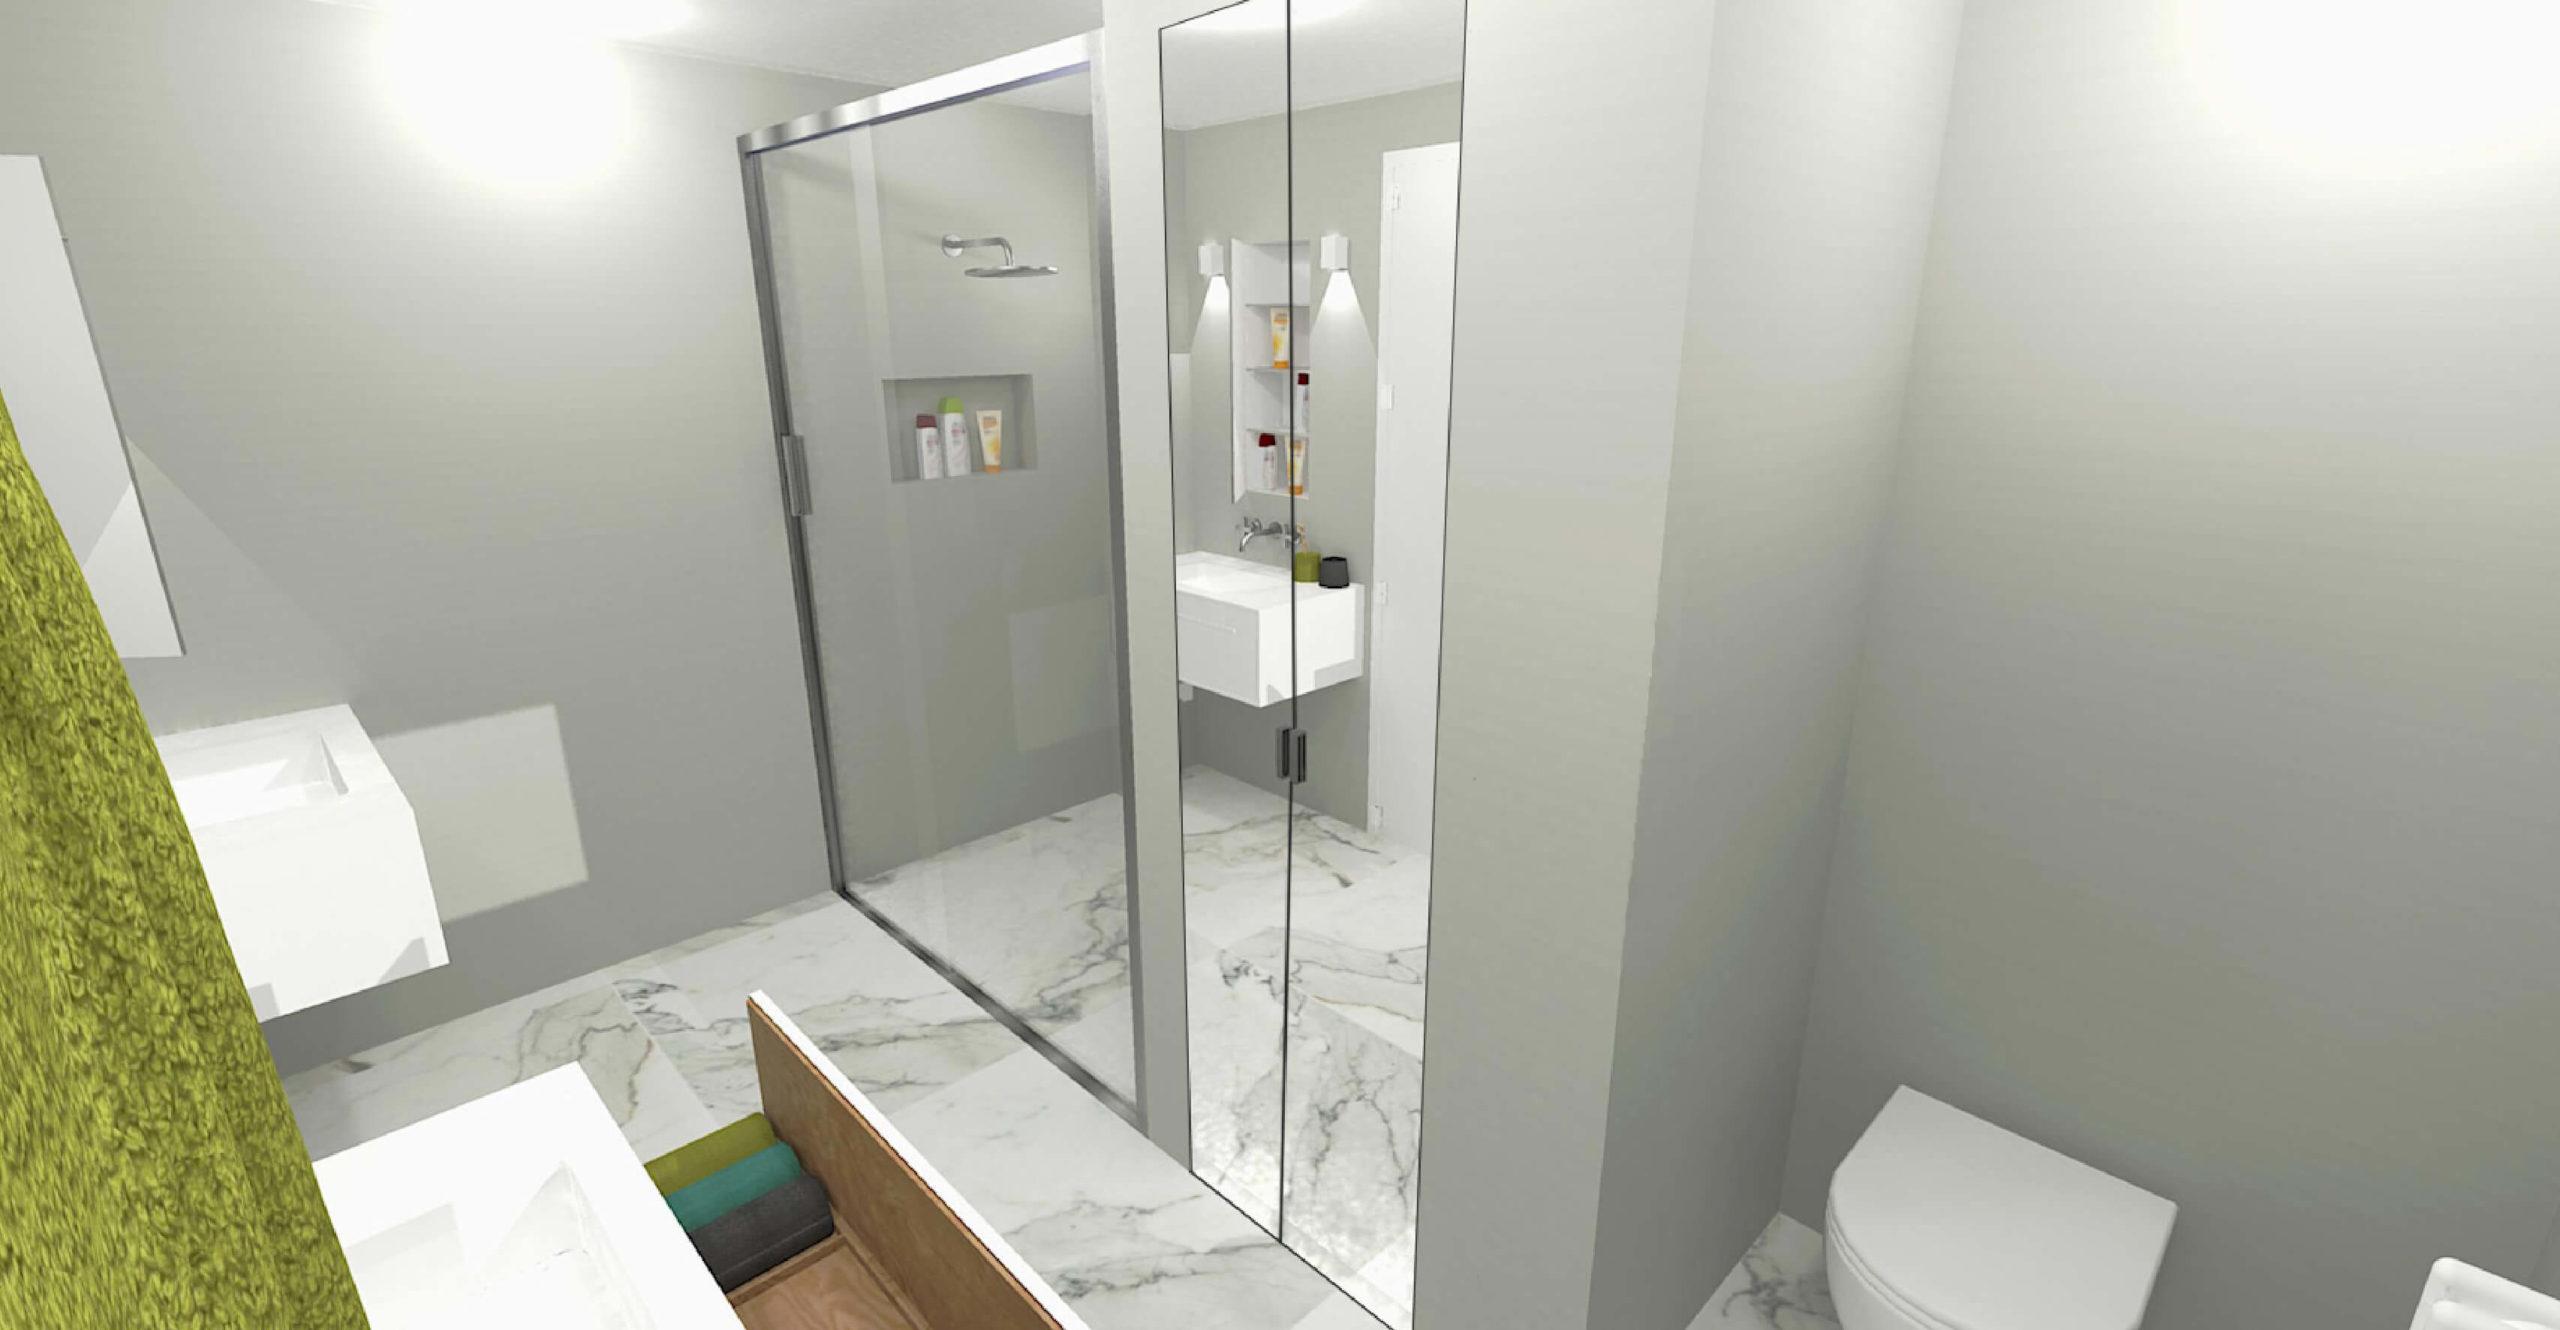 Lois-Miseray-Design-d'interieur-Salle-de-bain-4